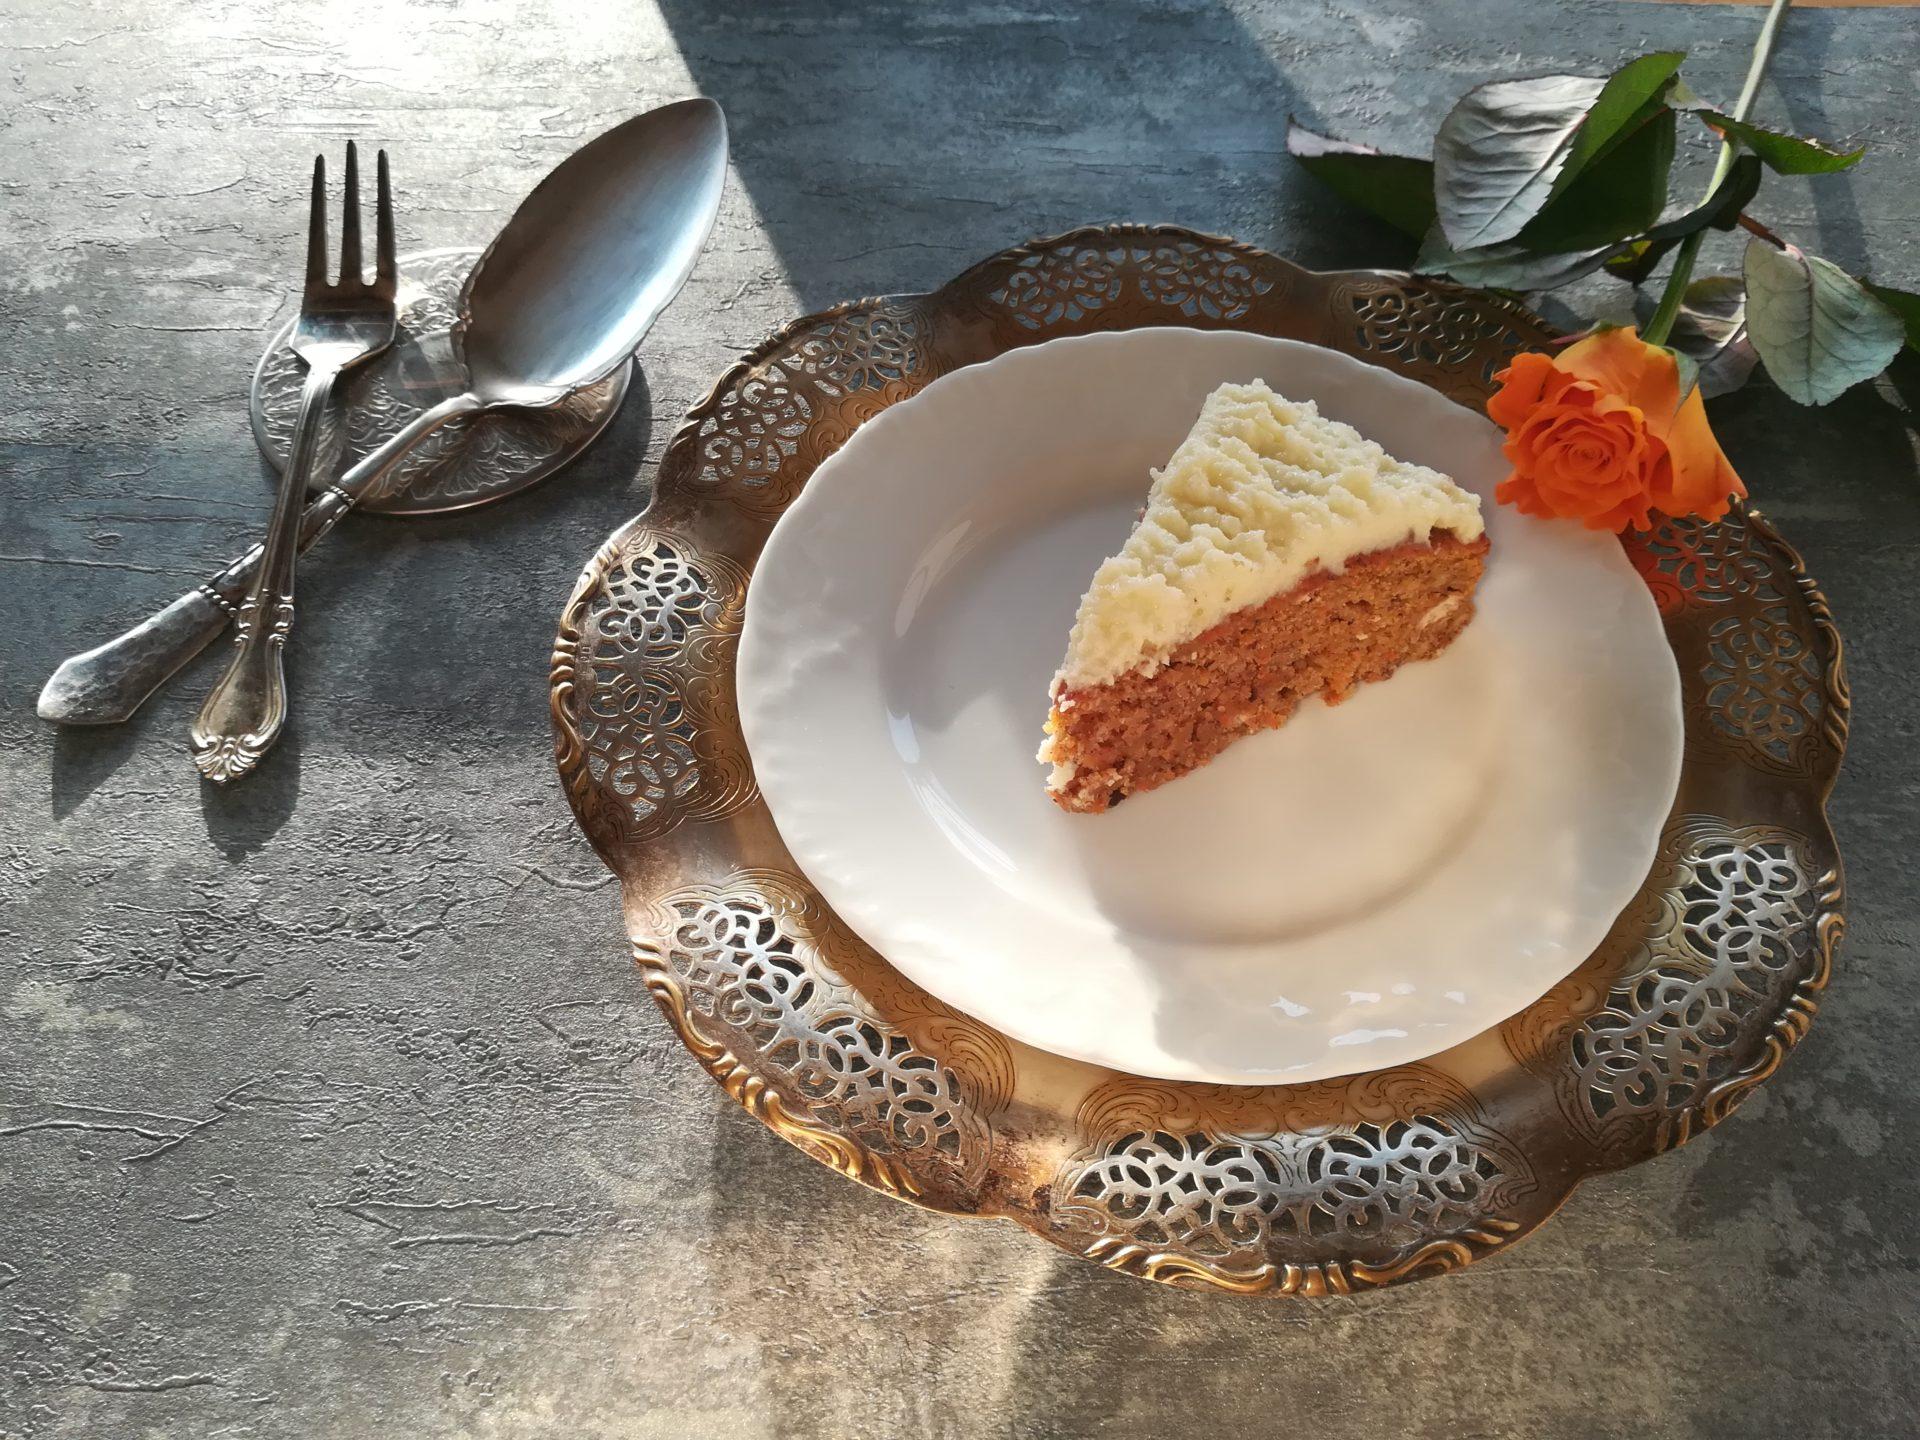 Le cordon bleu, marchewkowiec, najlepsze ciasto marchewkowe, ciasto marchewkowe z imbirem